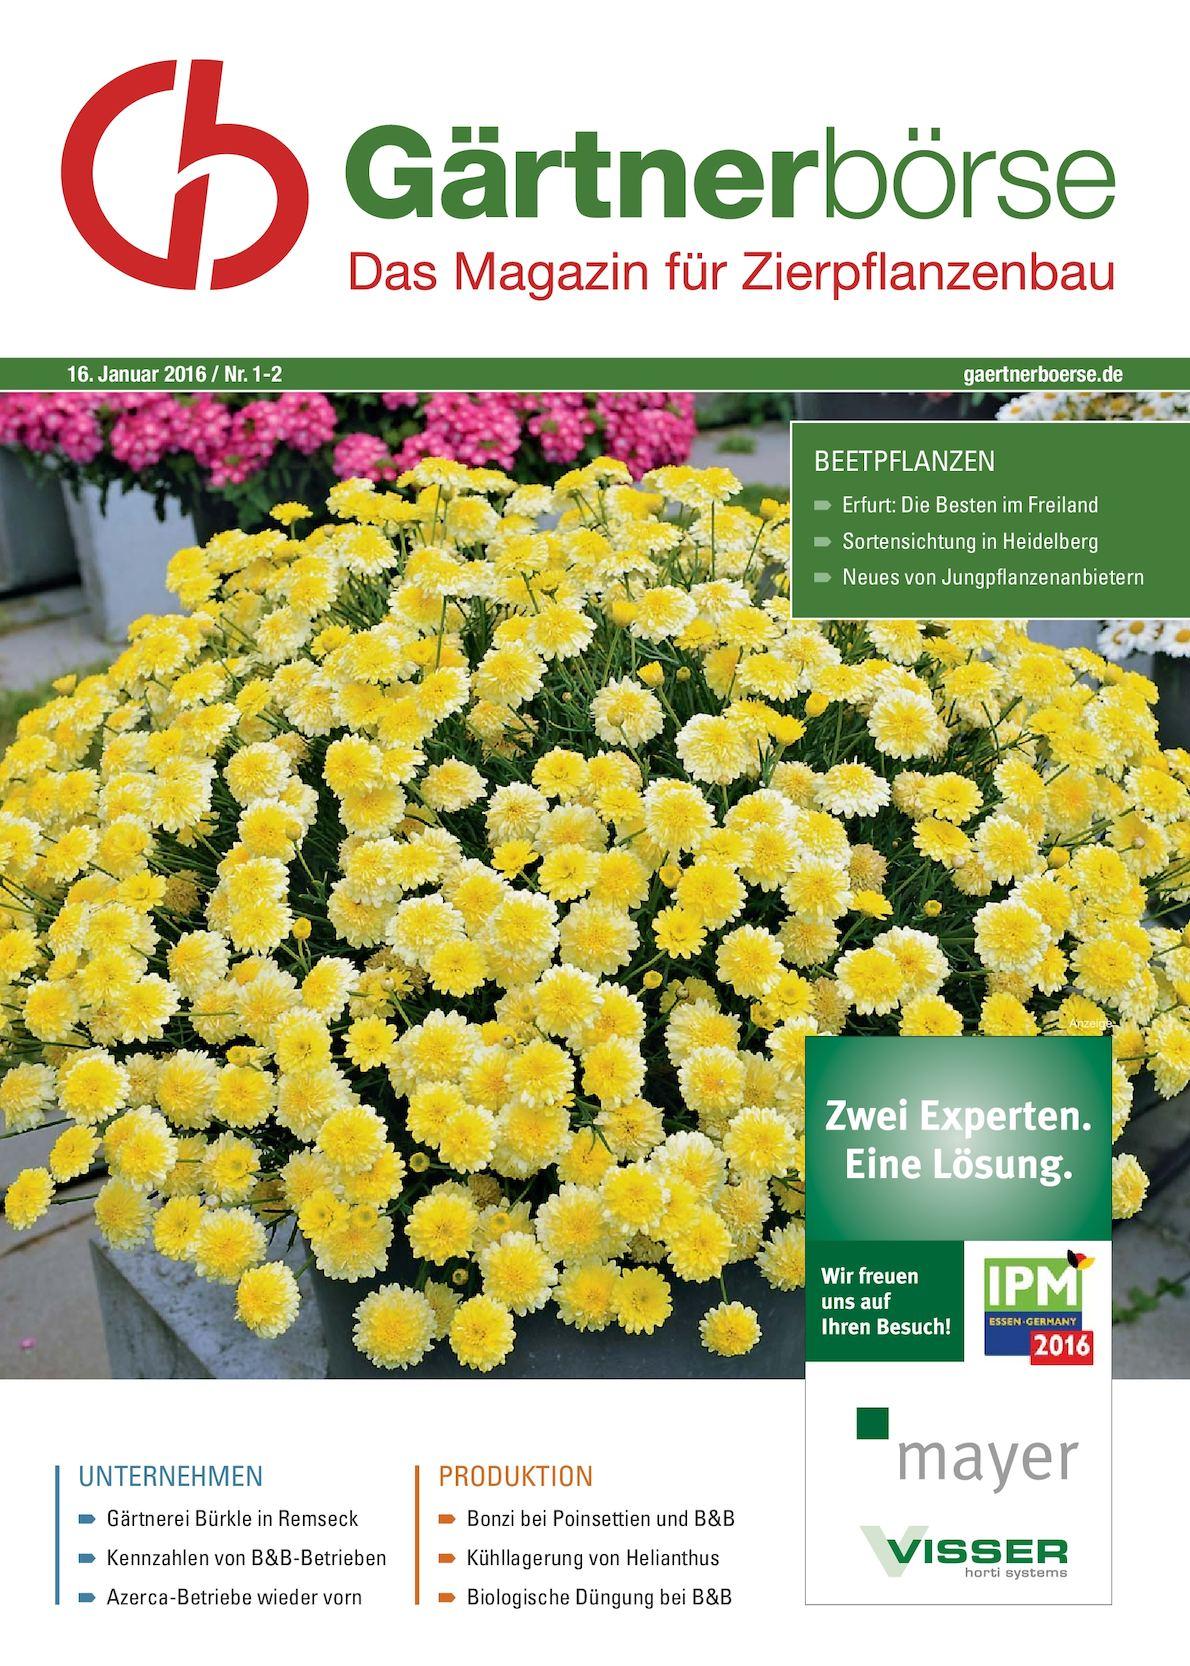 Beetbepflanzung Ideen Elegant Calaméo Gaertnerboerse Evt